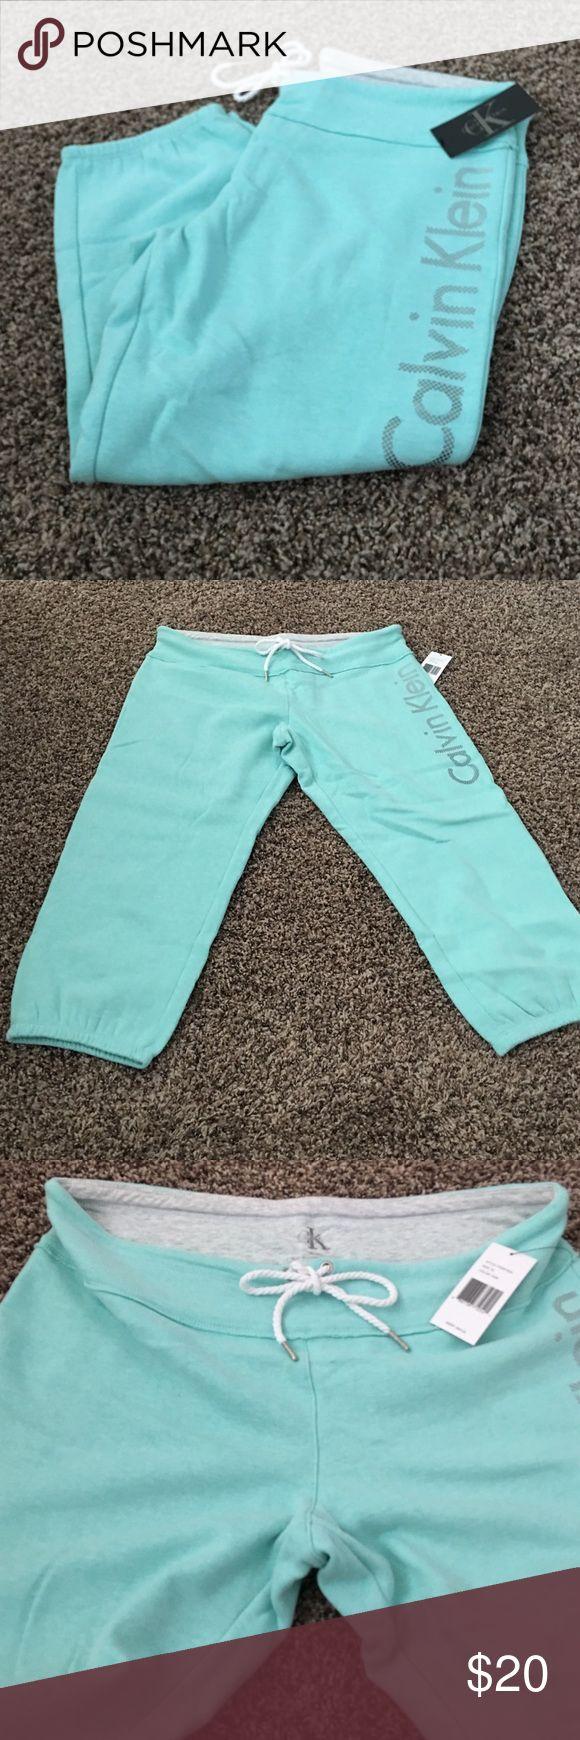 Calvin Klein Mint Capri Sweatpants XL New with tags - Calvin Klein - XL - color: aquamarine - Capri sweatpants - style: PFMP7653 Calvin Klein Pants Capris